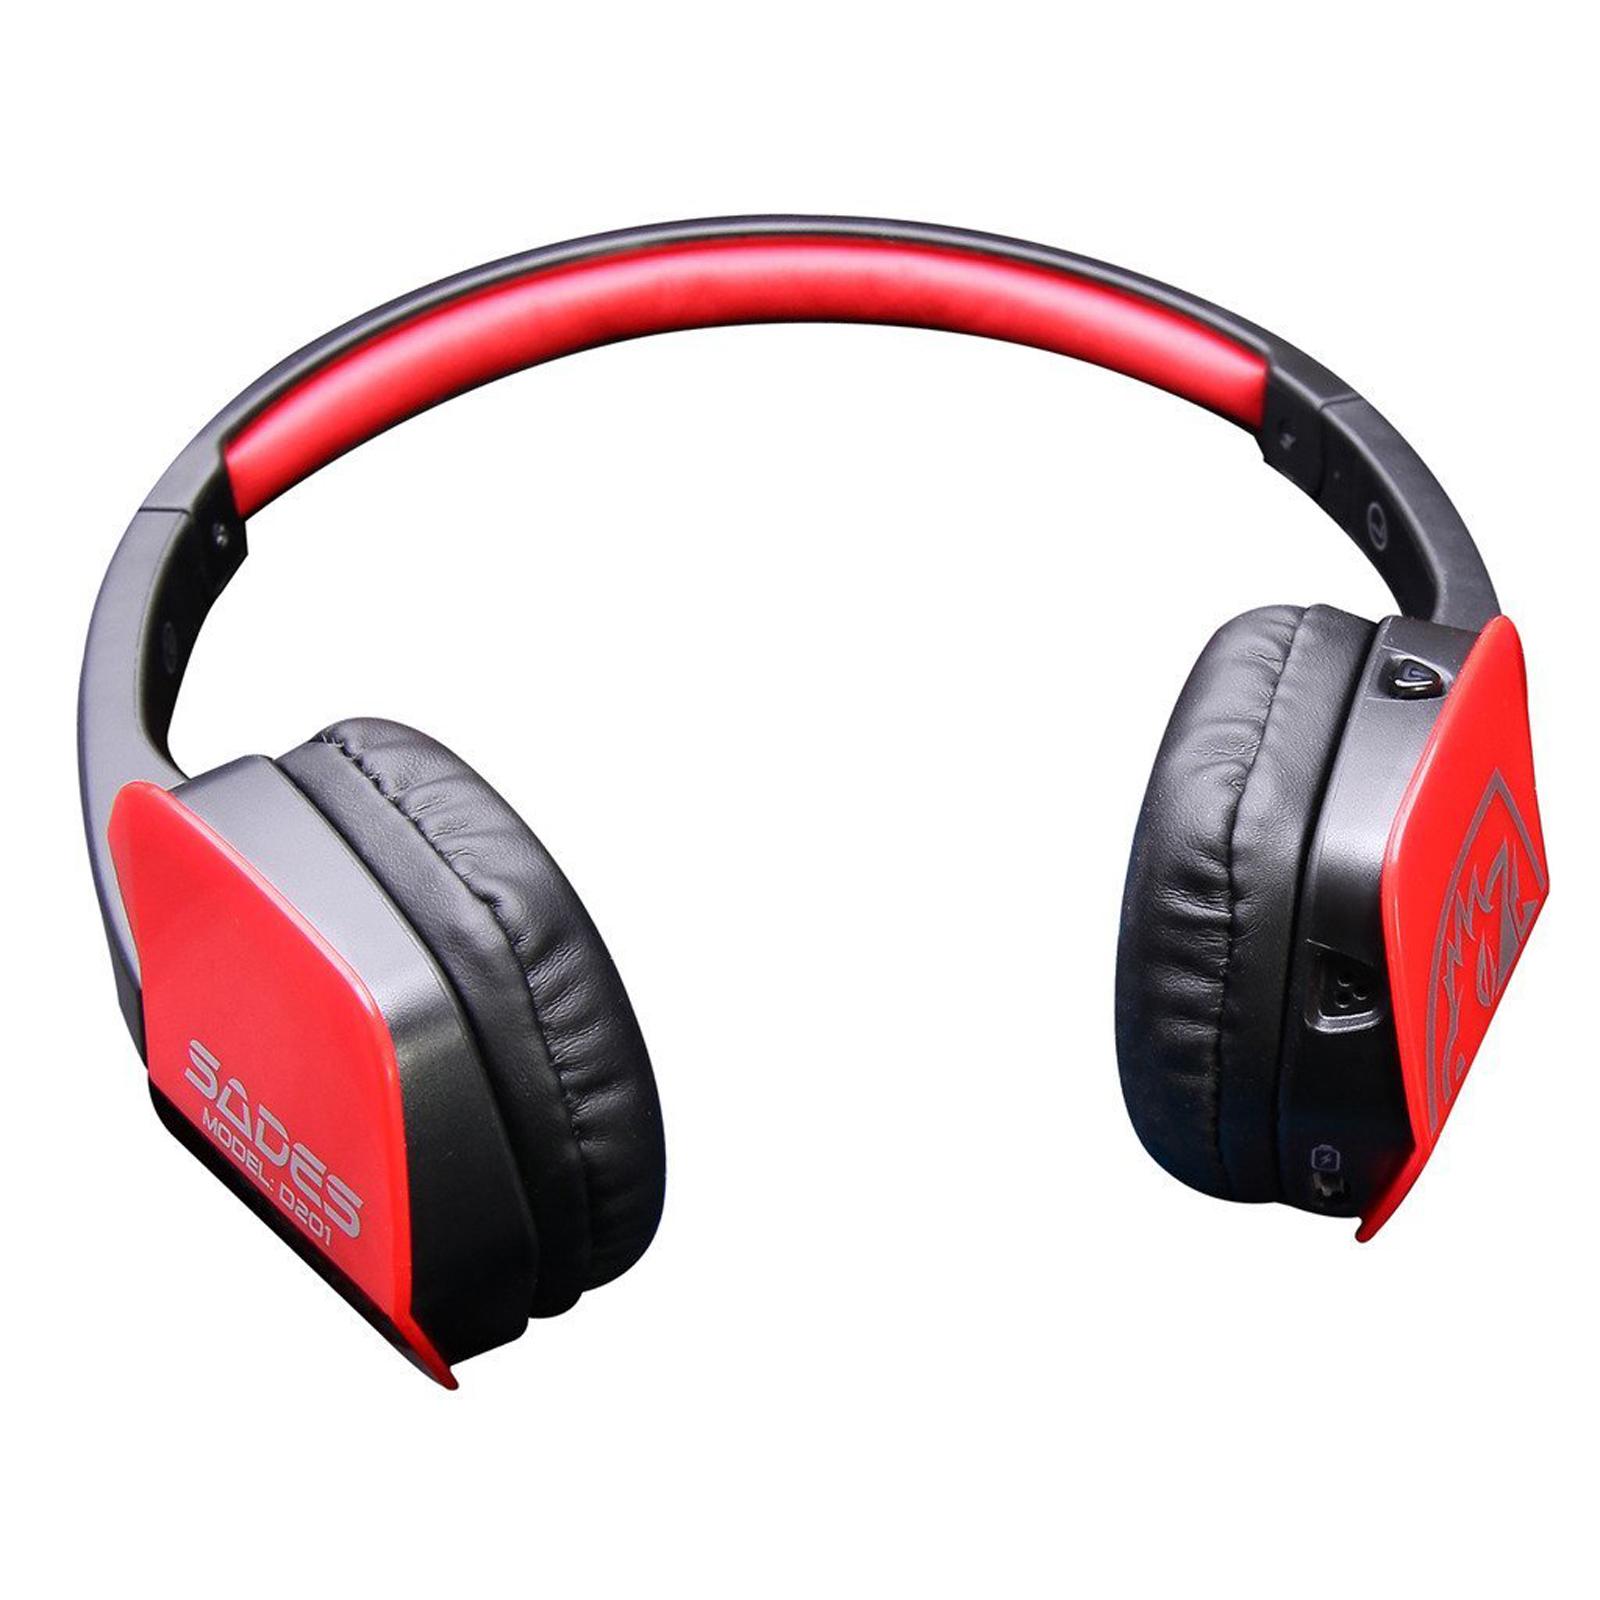 sades stereo wireless bluetooth gaming headset headphone. Black Bedroom Furniture Sets. Home Design Ideas